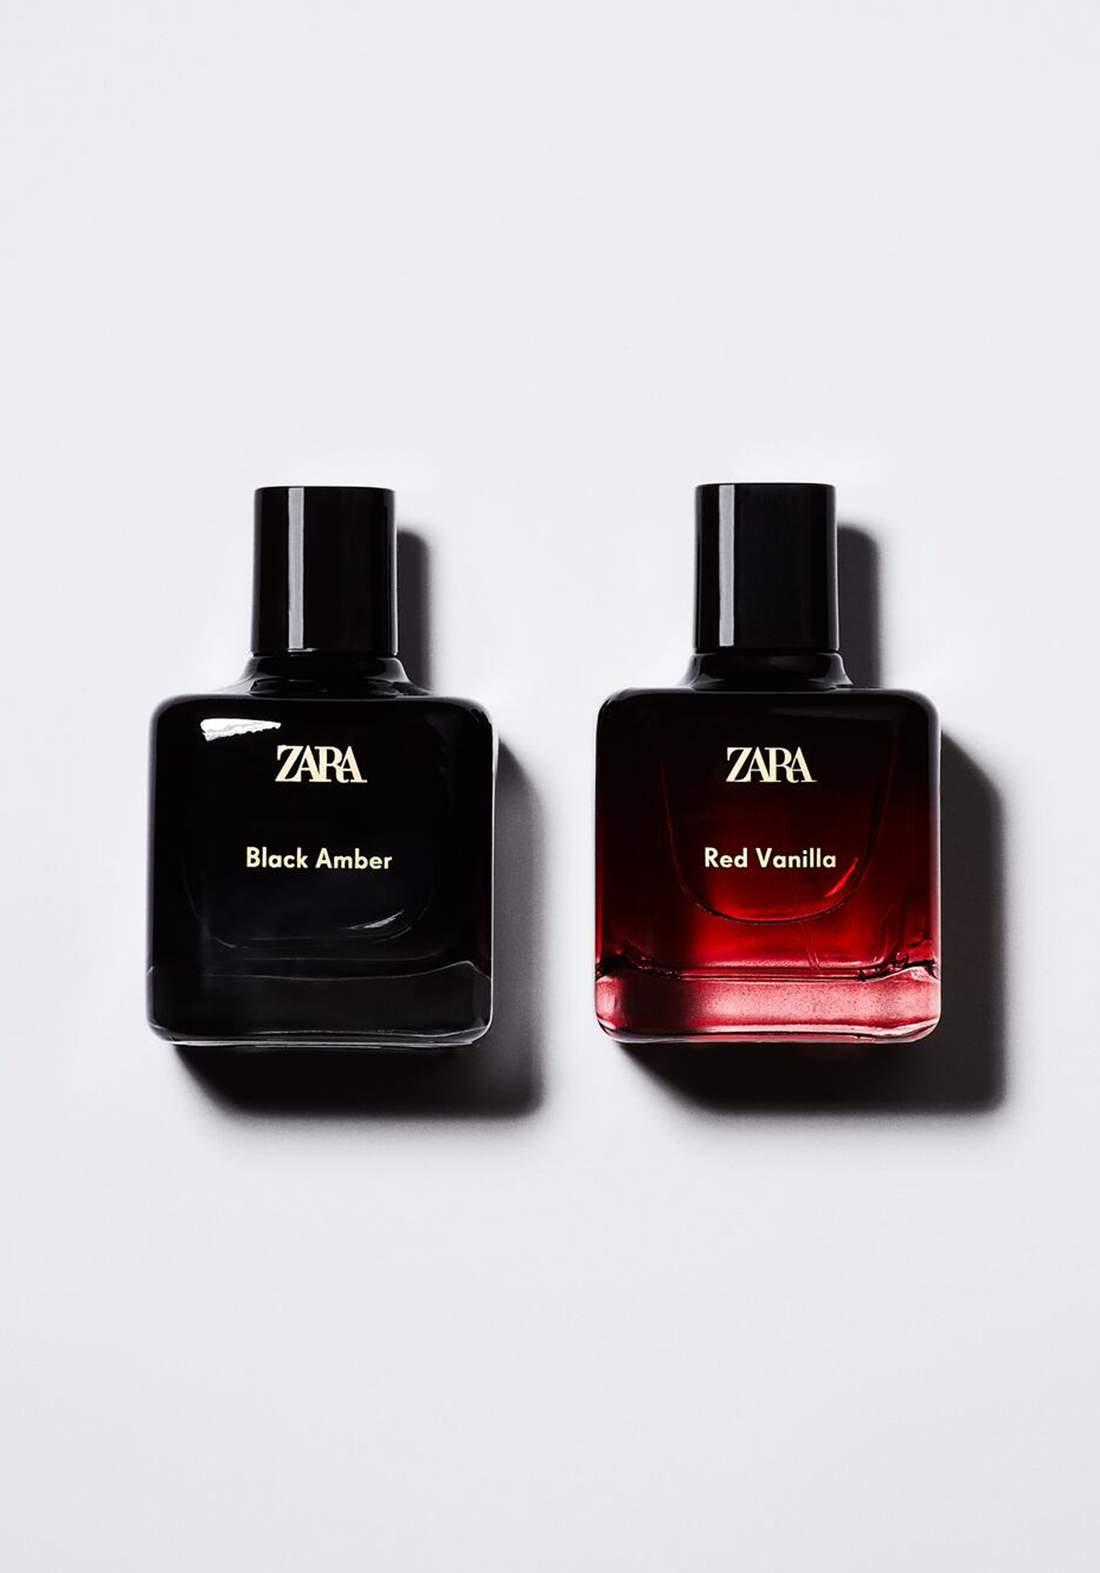 Zara black amber & red vanilla 2*100ml سيت عطور نسائي من زارا